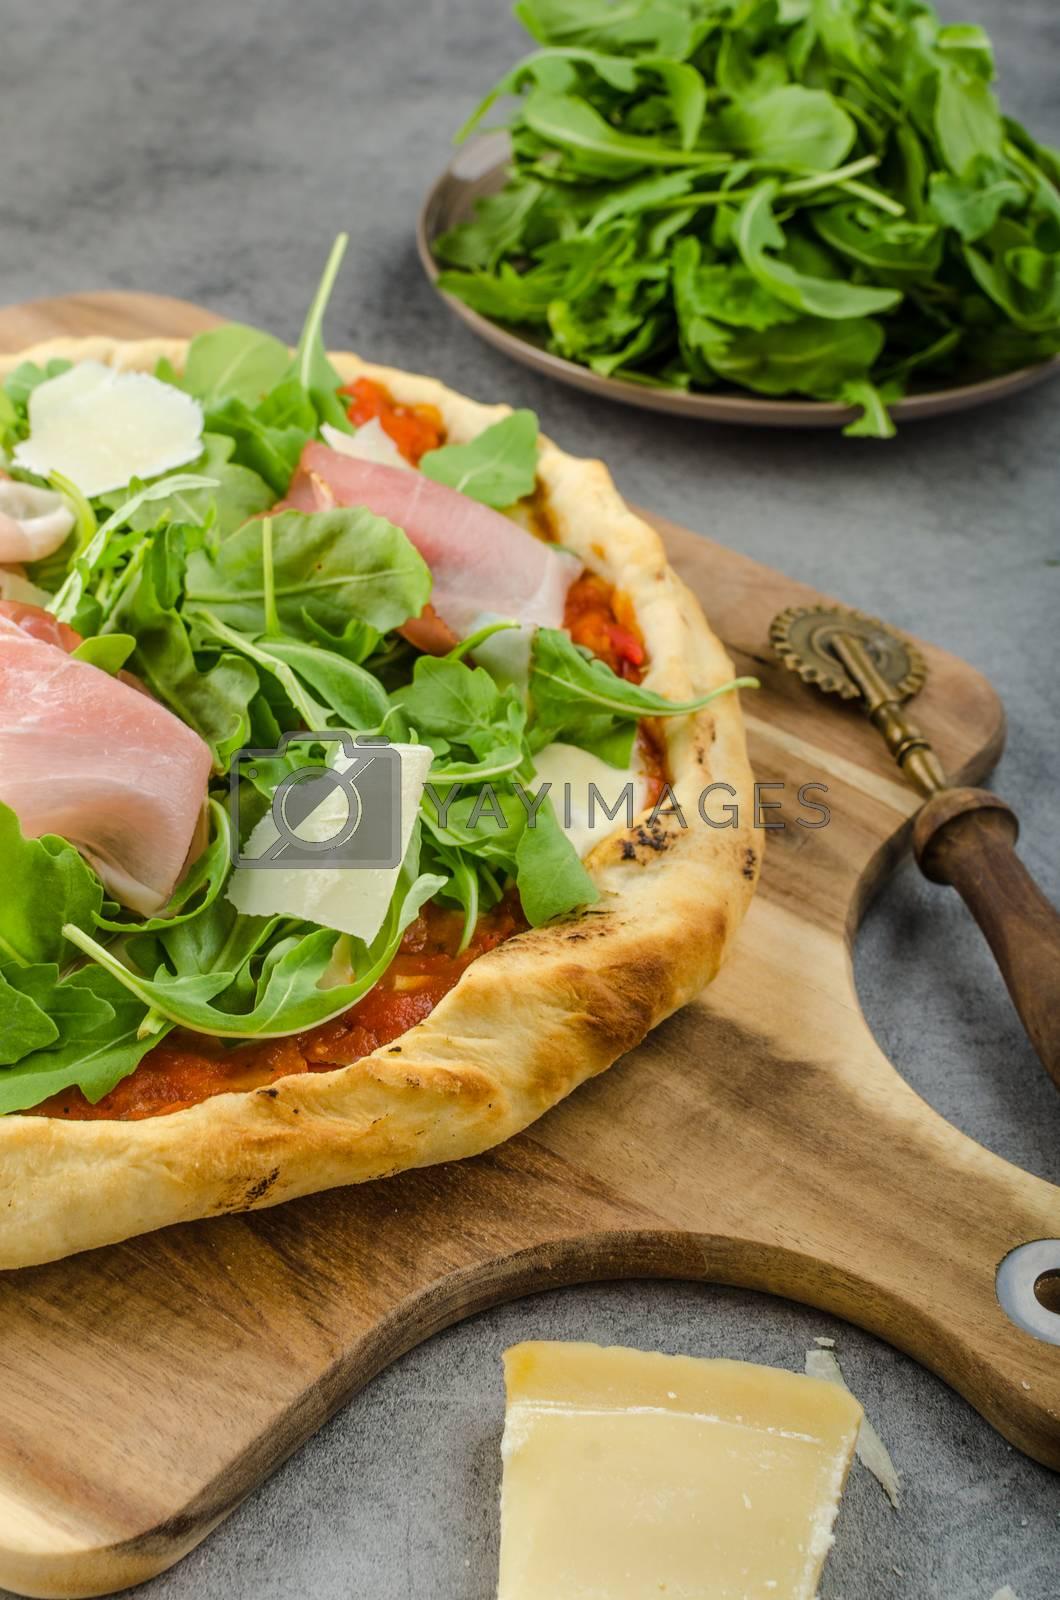 Rustic pizza with arugula, Parma ham and Parmesan